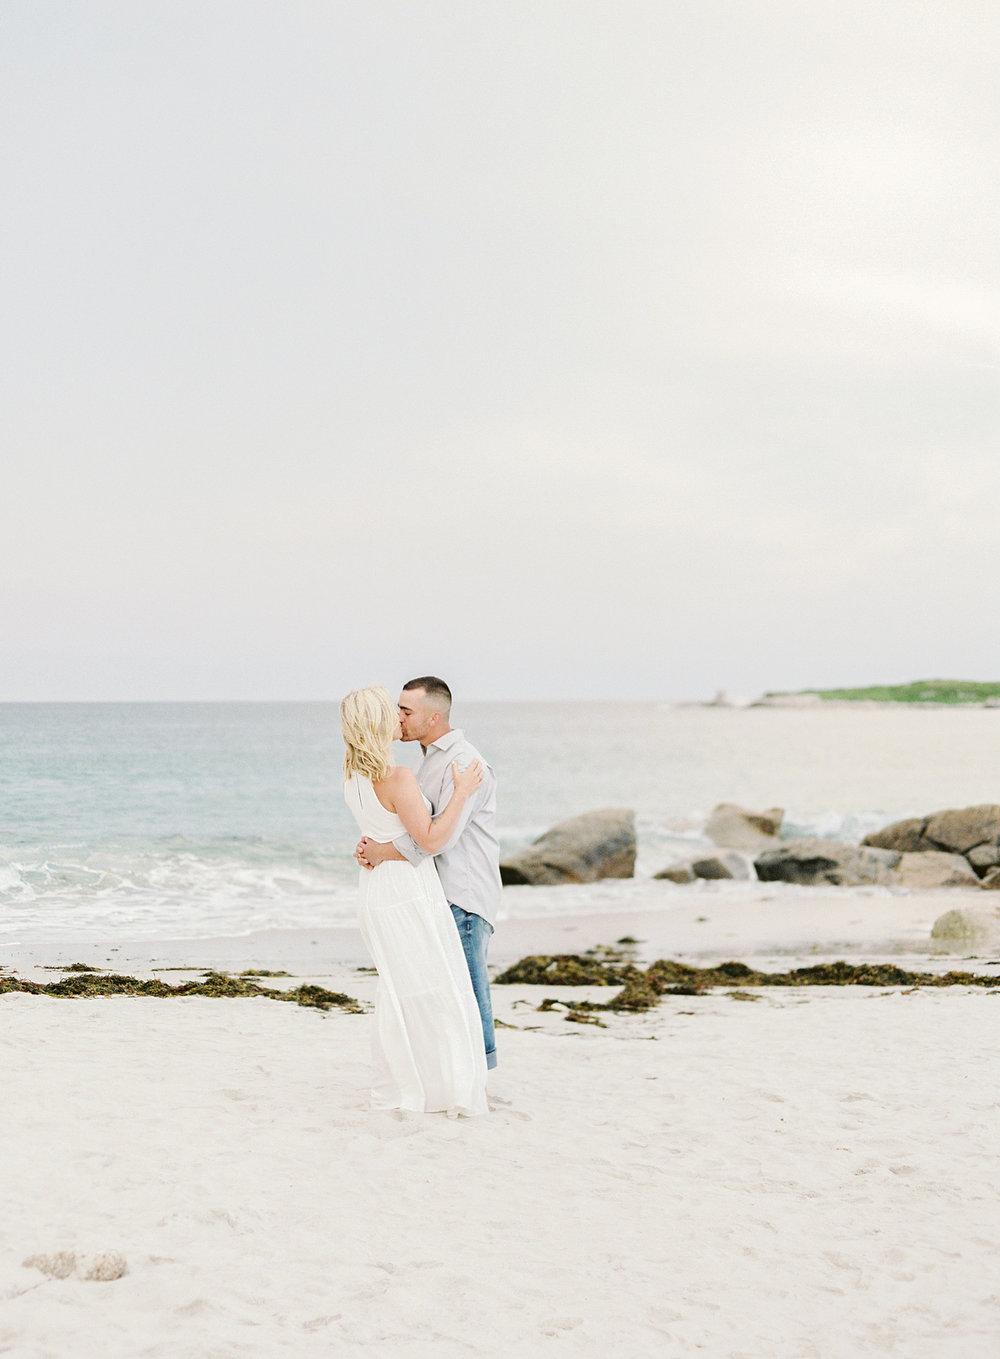 Halifax Wedding Photographer, Jacqueline Anne Photography, Crystal Crescent Beach, Nova Scotia Engagement